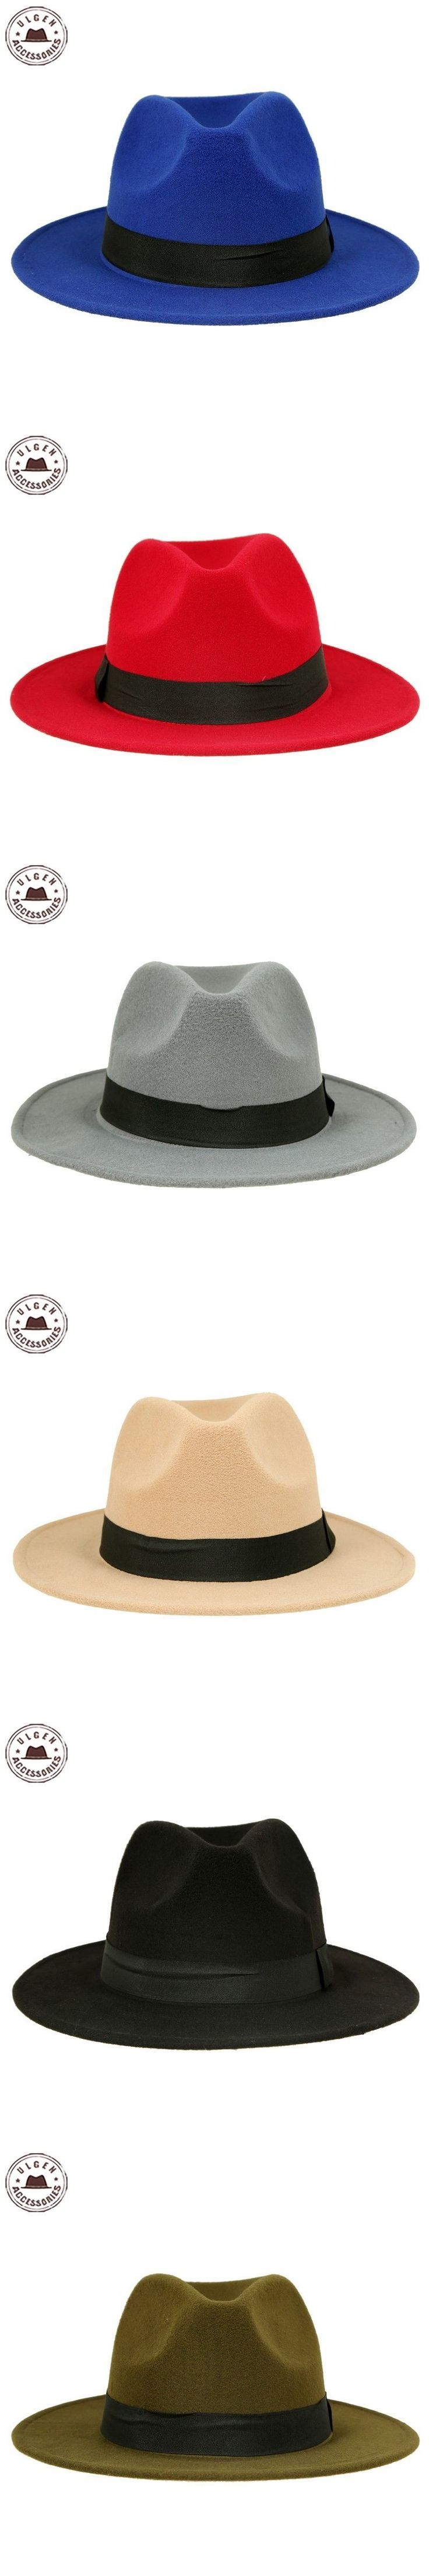 Hot sale cheap unisex wool Jazz hats mens fedora hat women felt hat cowboy panama hats for women derby fedoras [HUB048g1100] #HatsForWomenDerby #CowboyHatsForWomen